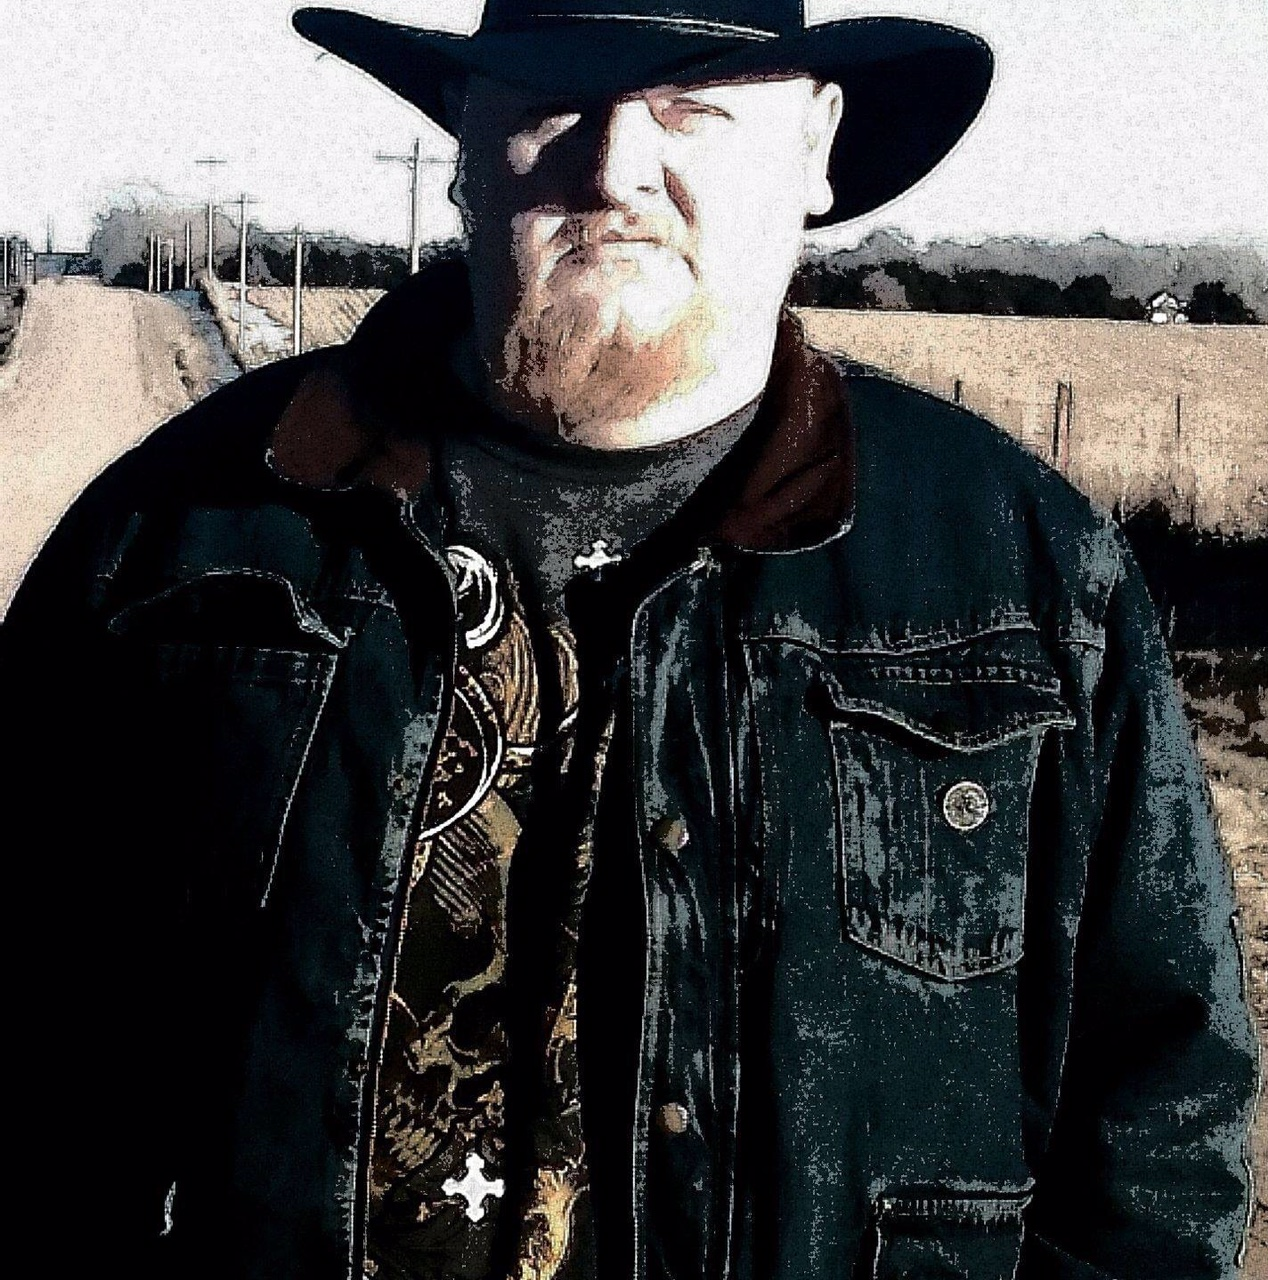 Jason Rohloff, age 40, of Creighton, Nebraska